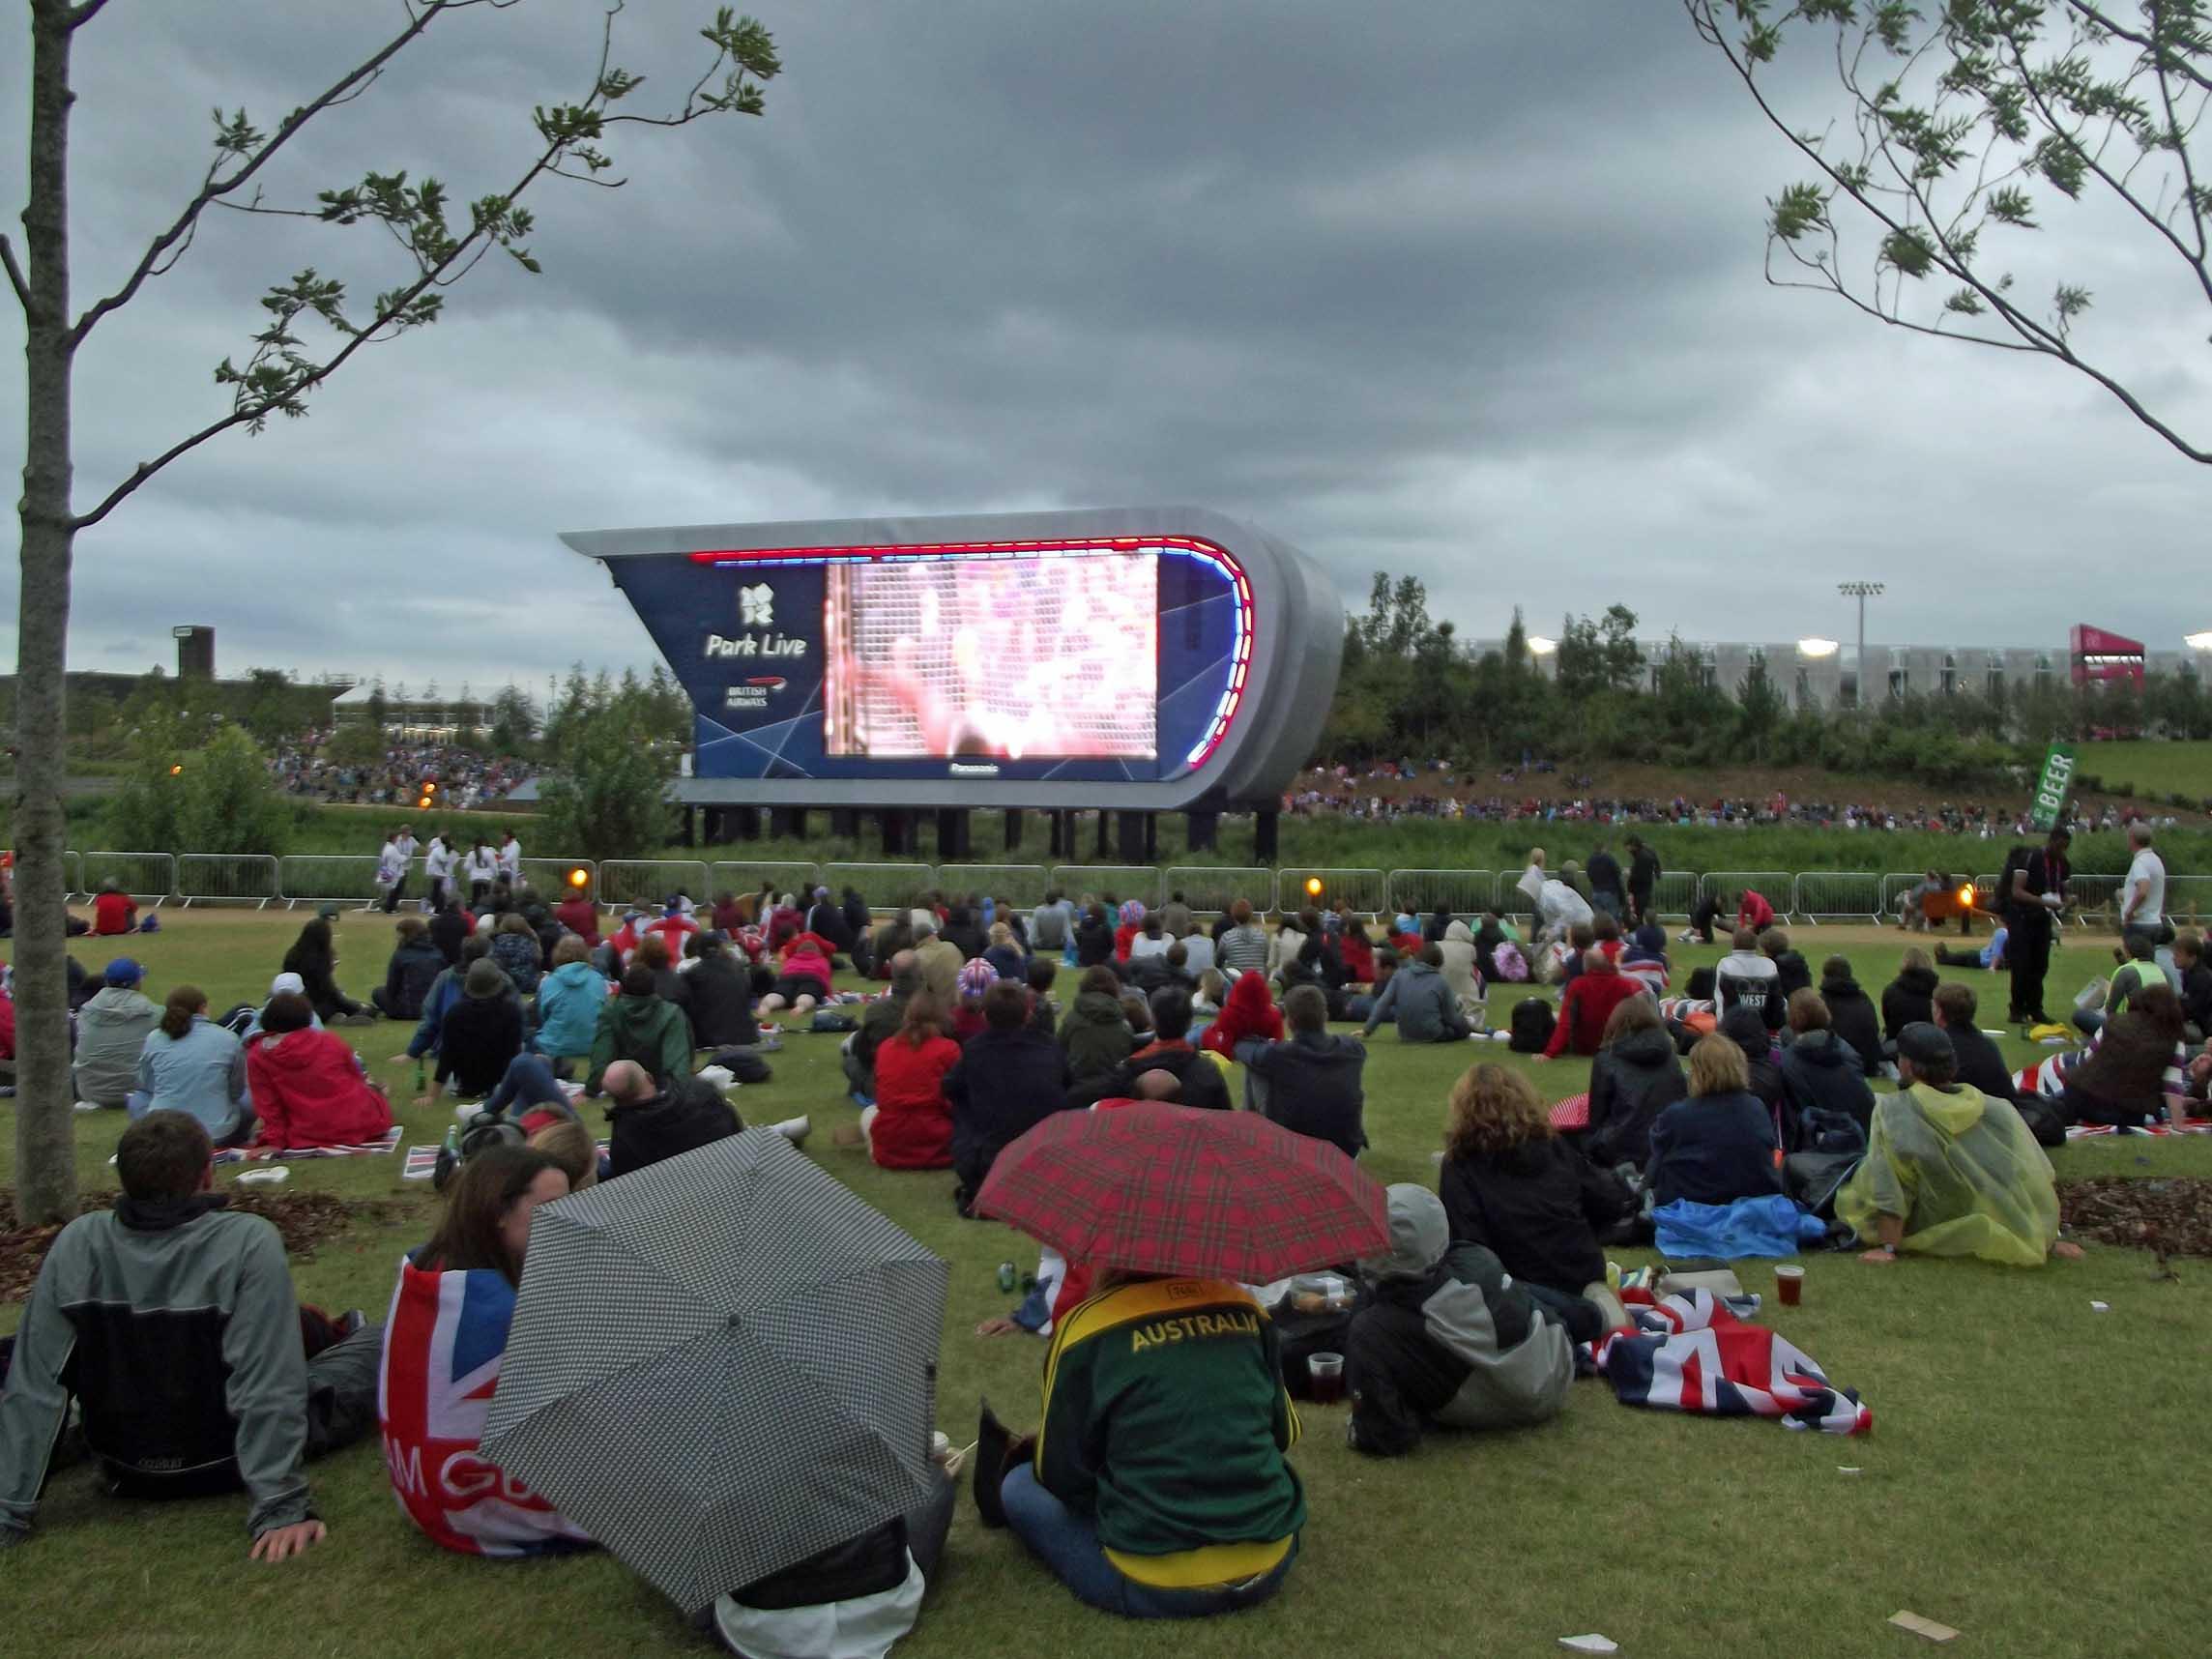 People on grass watching big screen